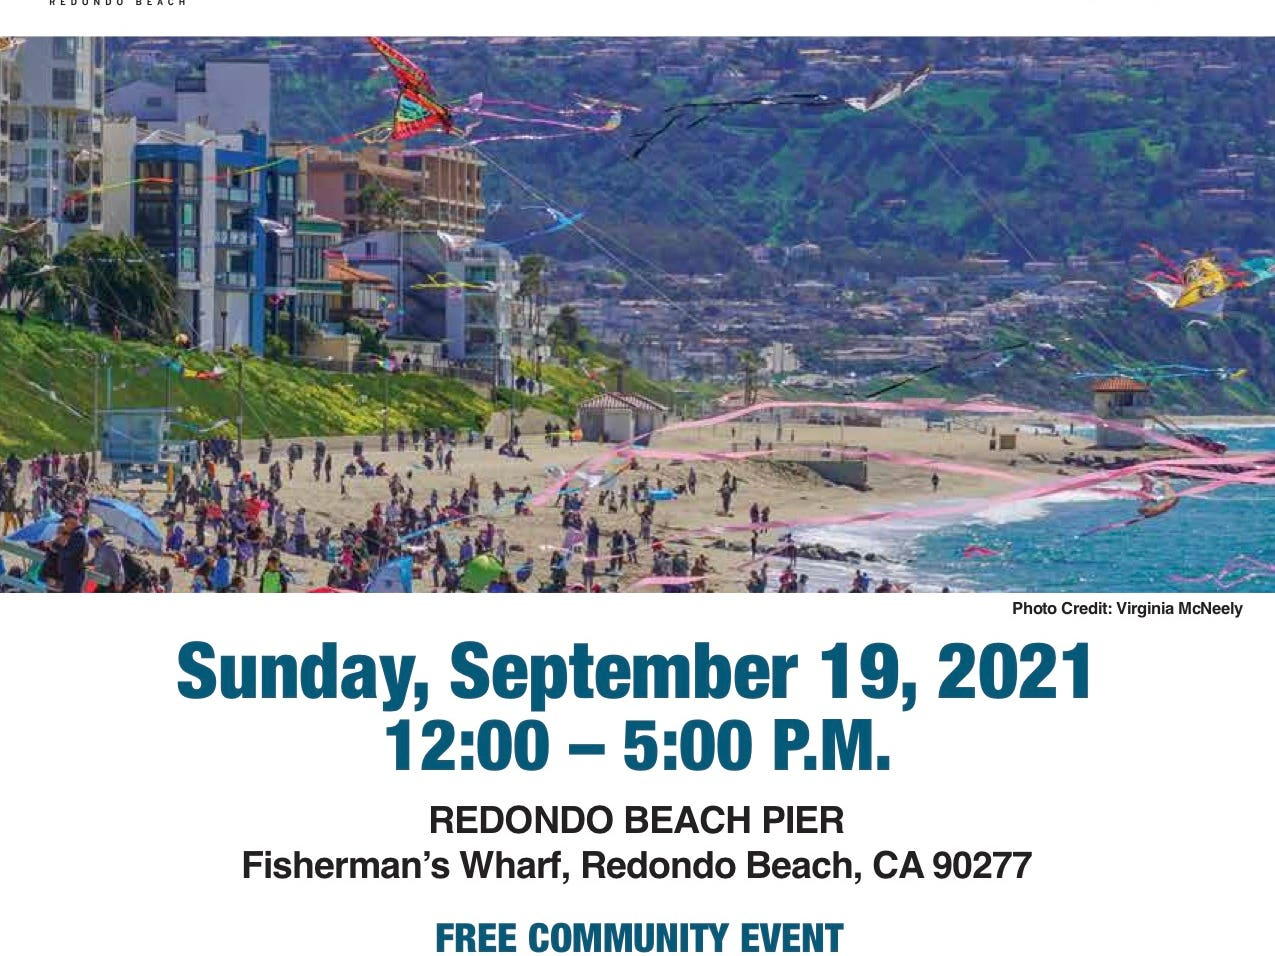 Redondo Beach Pier 47th Annual Festival of the Kite Flyer